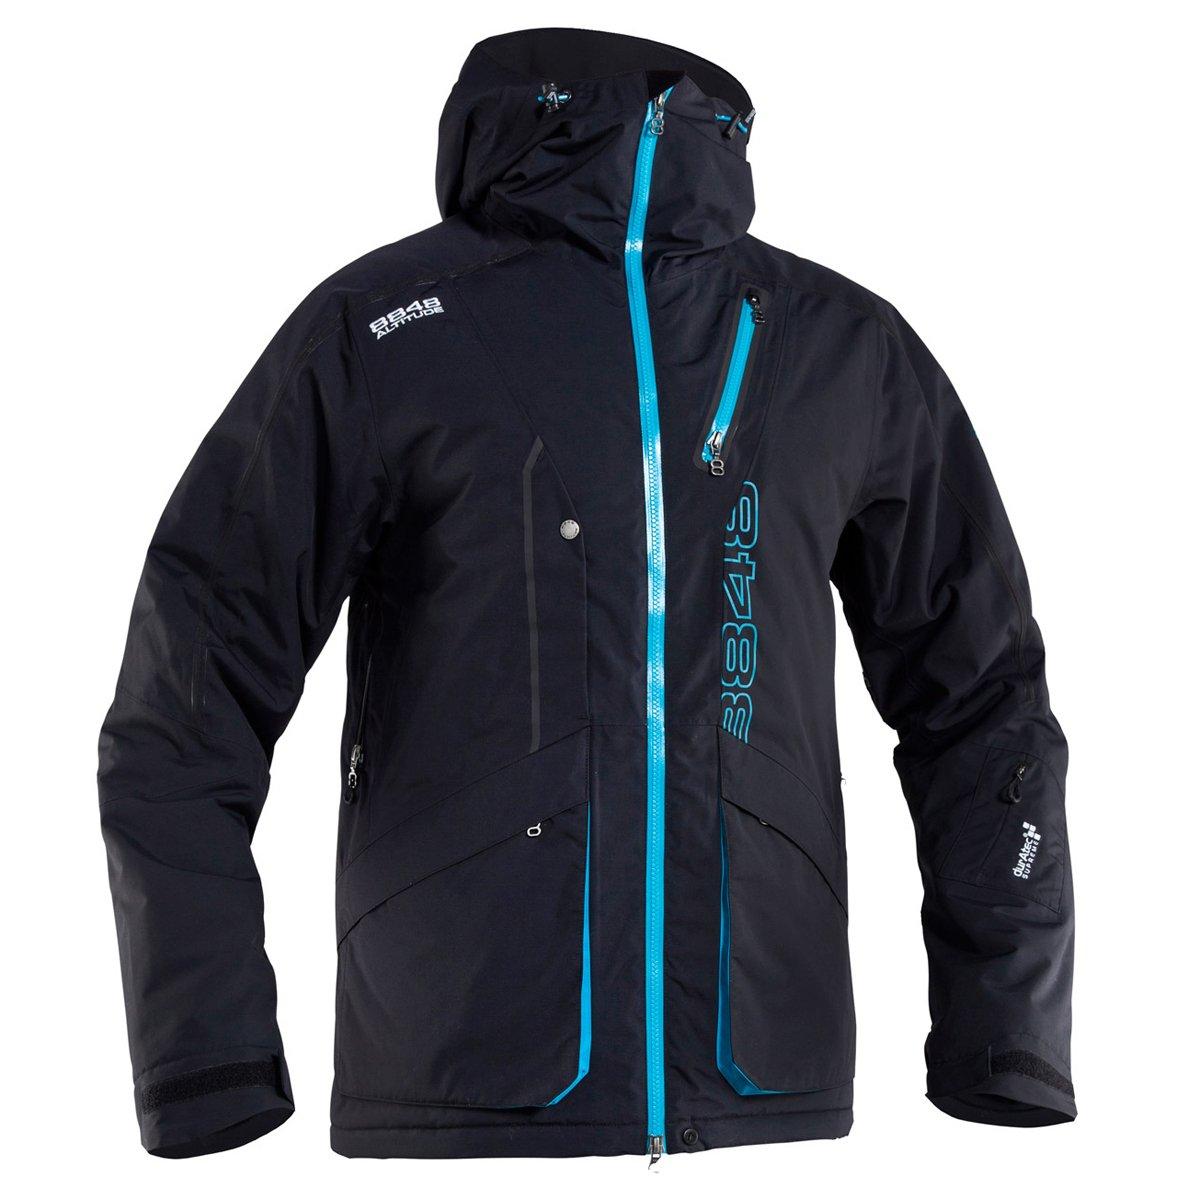 8848 ALTITUDE MIRAGE 10.000mm Herren Skijacke Snowboardjacke Outdoor Jacke 7832 jetzt kaufen